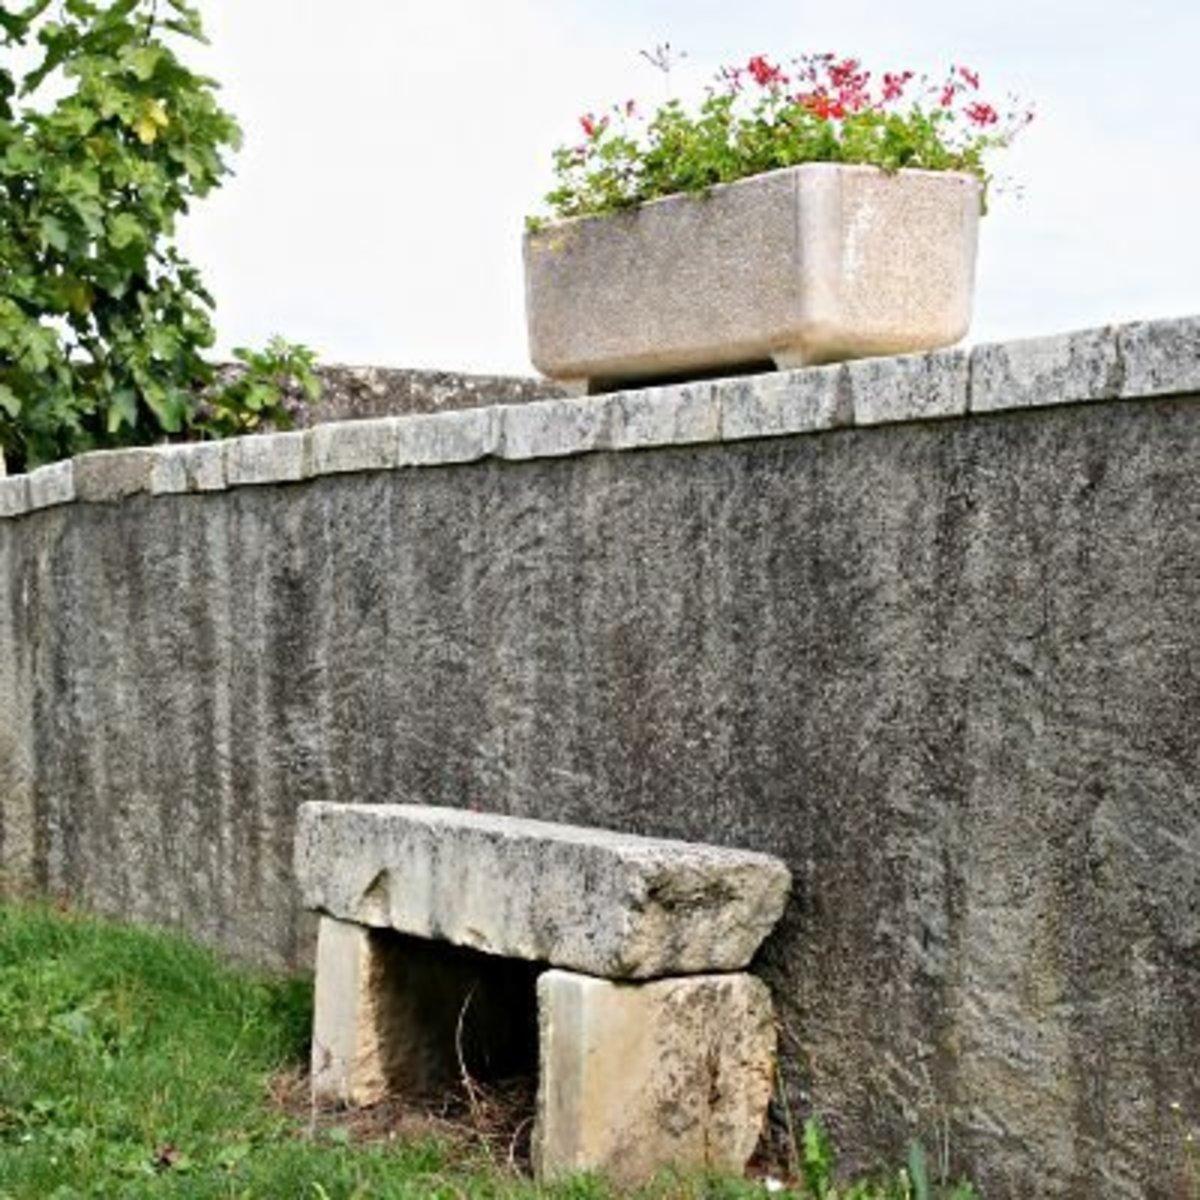 A stone seat